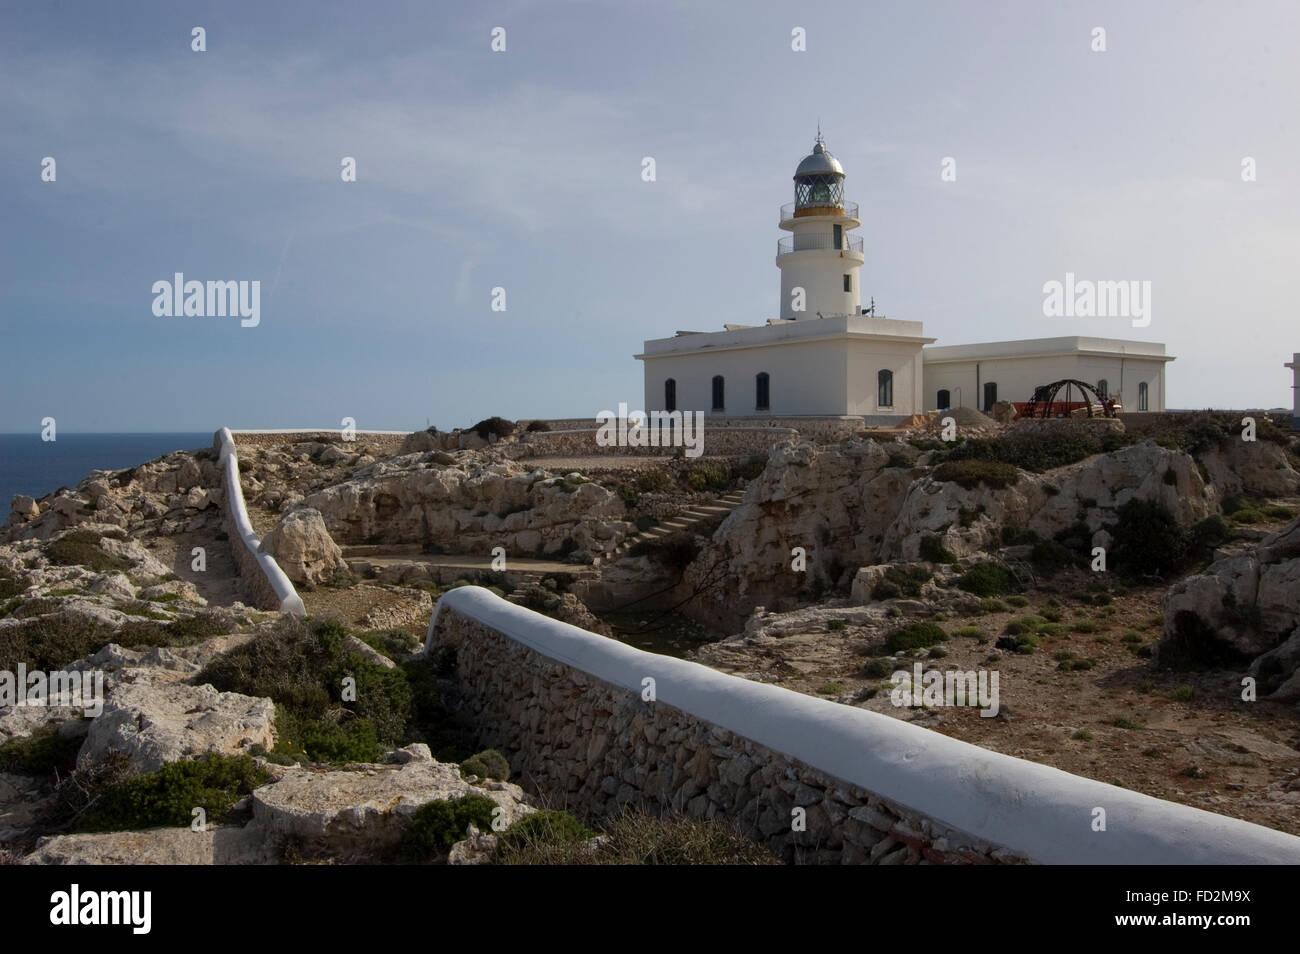 Lighthouse at Cap de Cavalleria, North Menorca, Menorca Island, Balearic Islands, Spain, Southern Europe - Stock Image